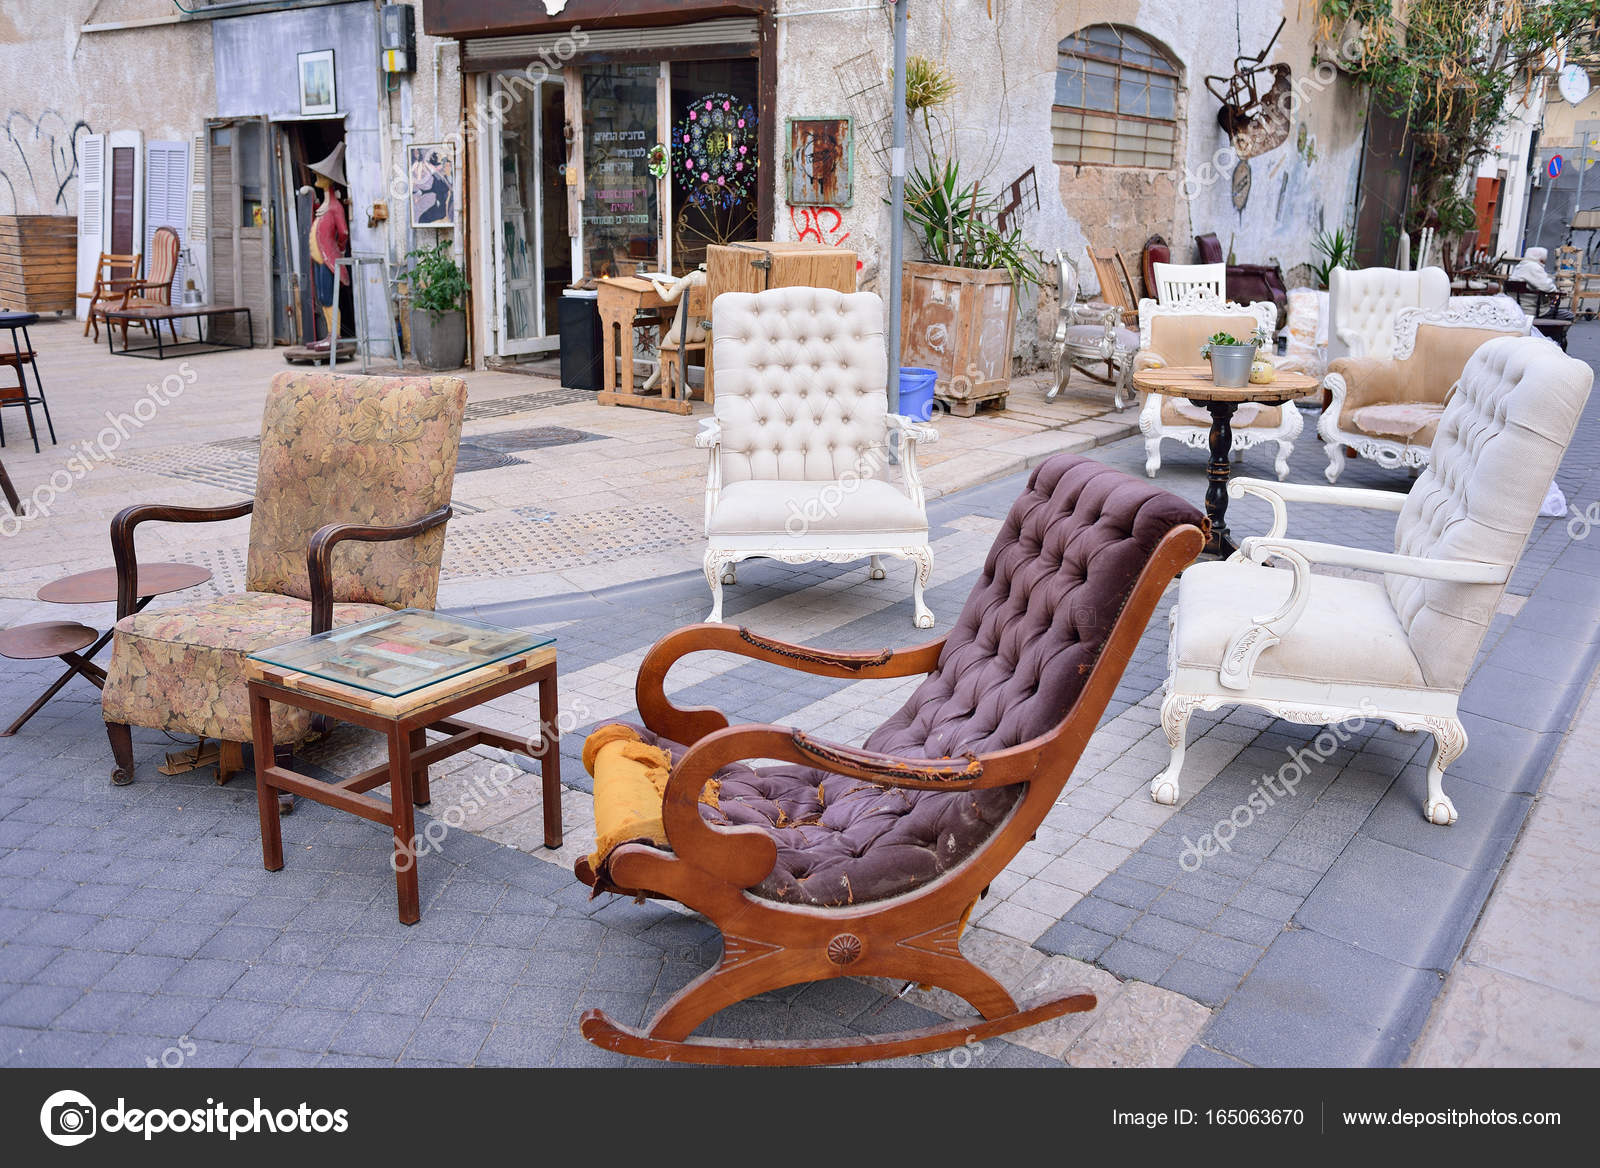 Tel Aviv Israel April 2017 Flohmarkt In Der Alten Stadt Jaffa